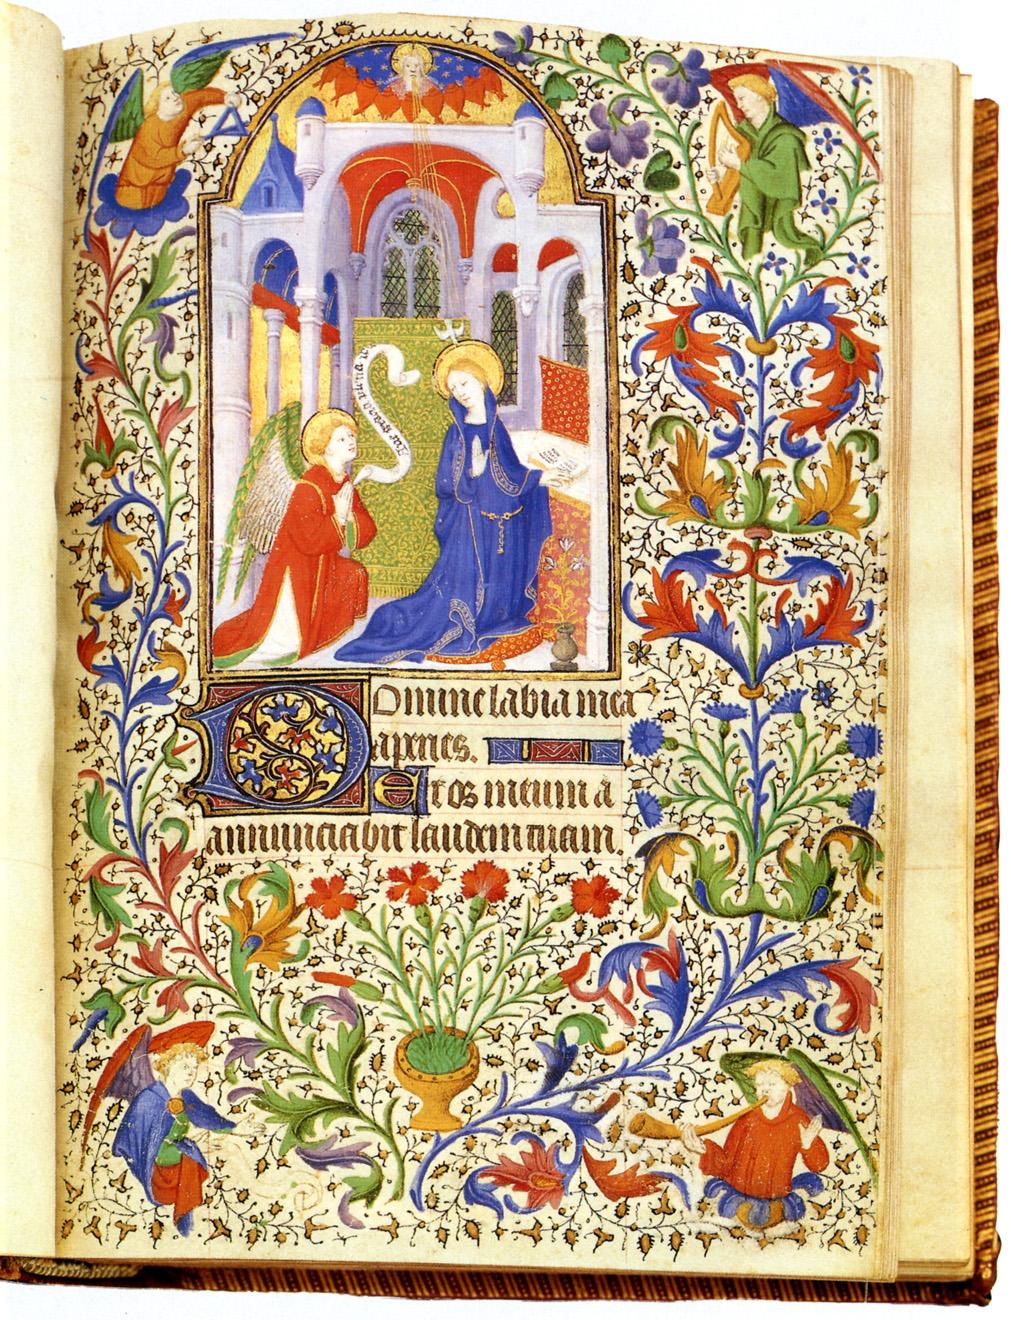 Illuminated manuscript from Europe